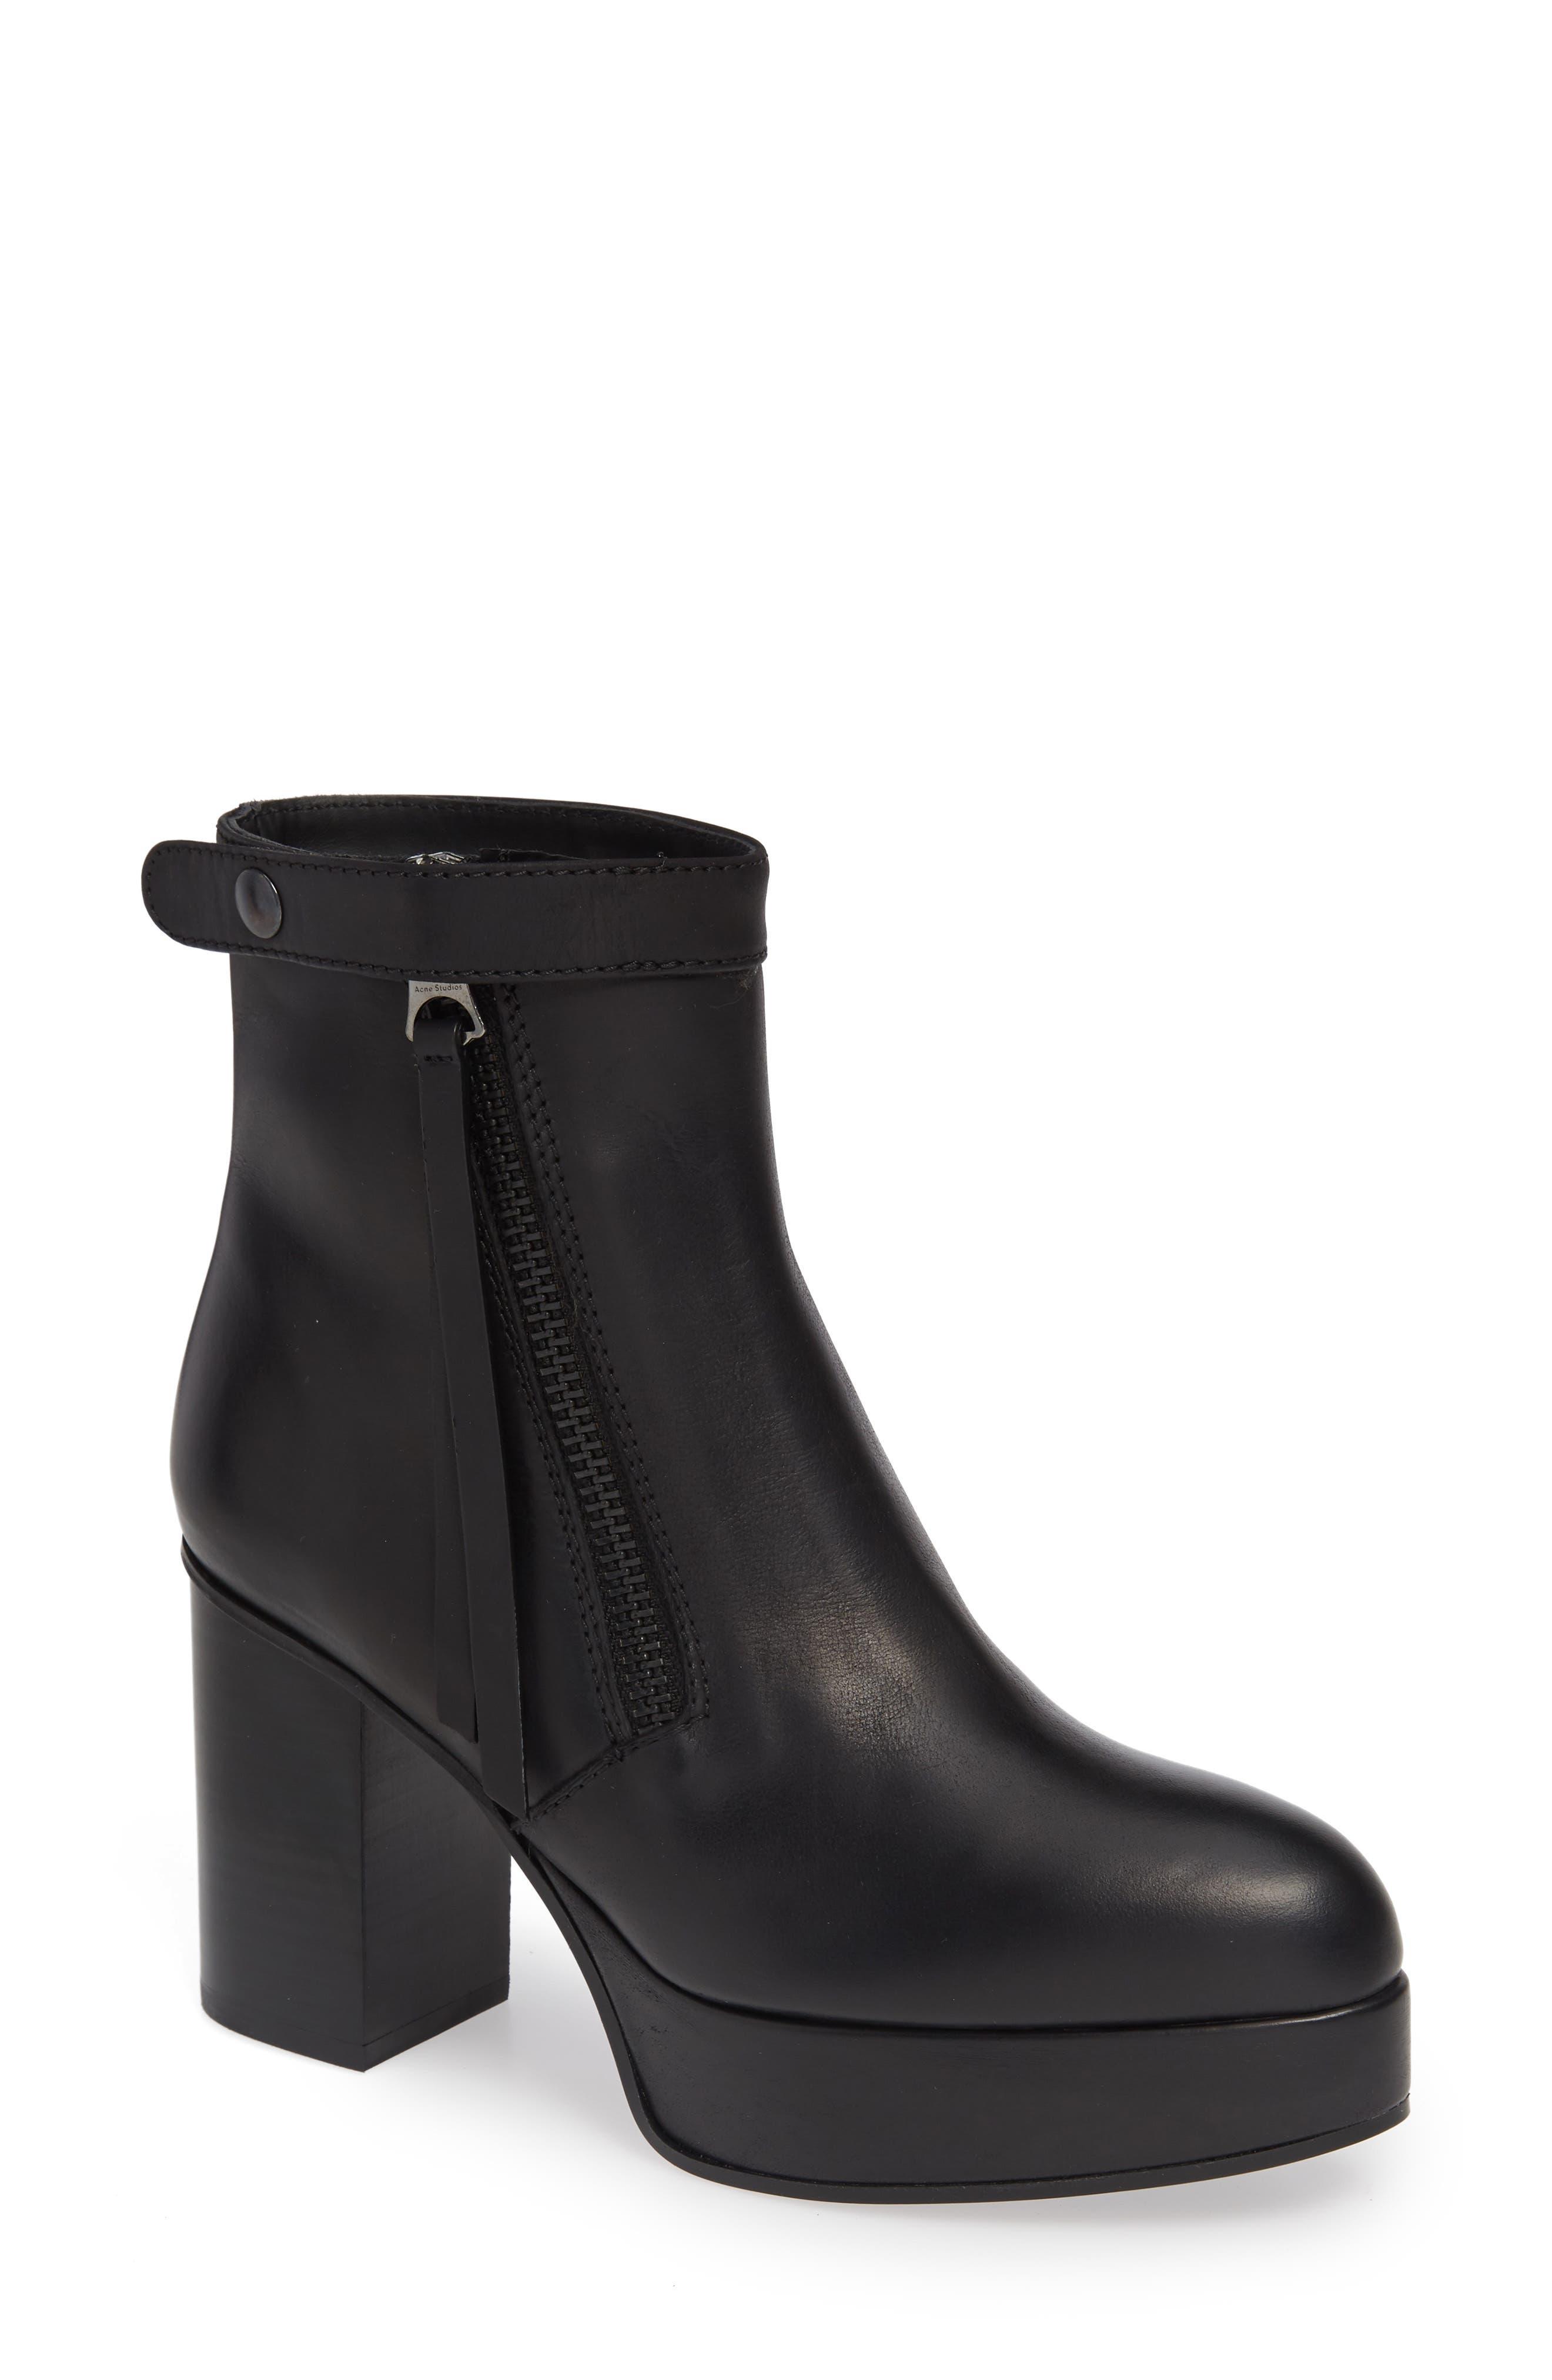 1fb1cdd546c0b Women's Acne Studios Boots | Nordstrom